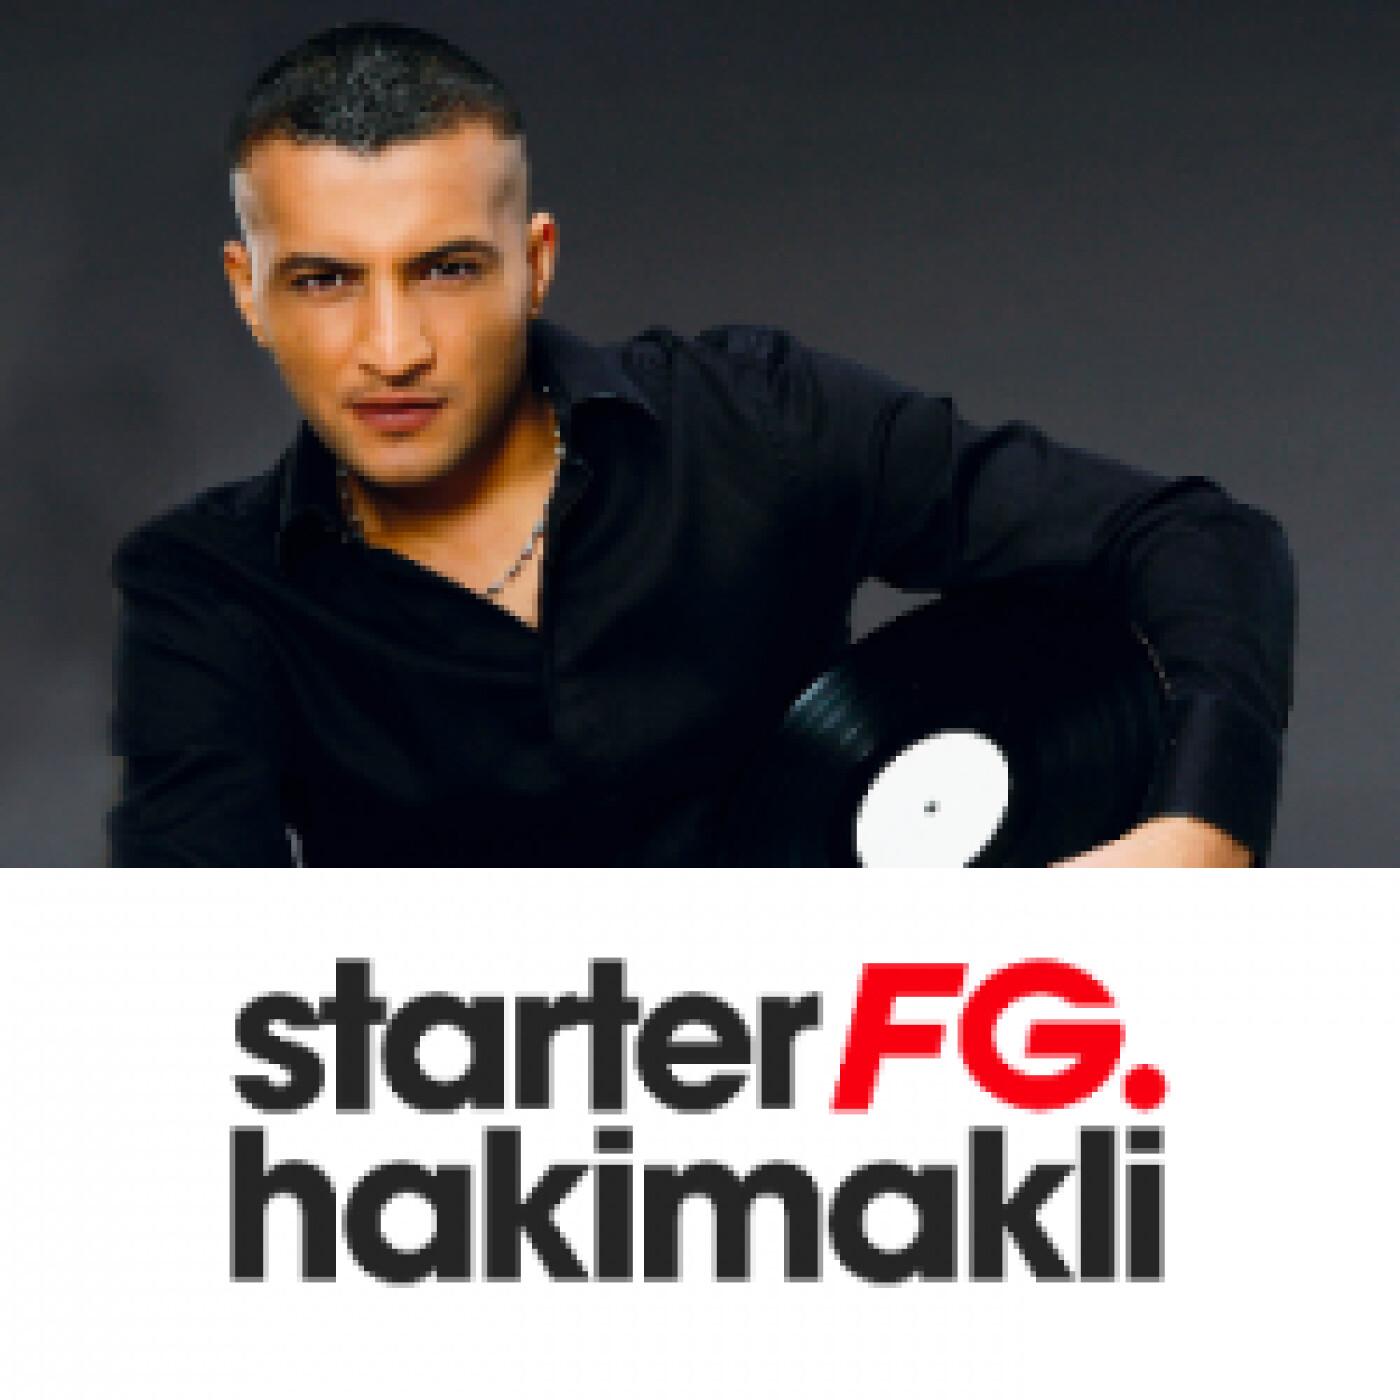 STARTER FG BY HAKIMAKLI MERCREDI 17 MARS 2021